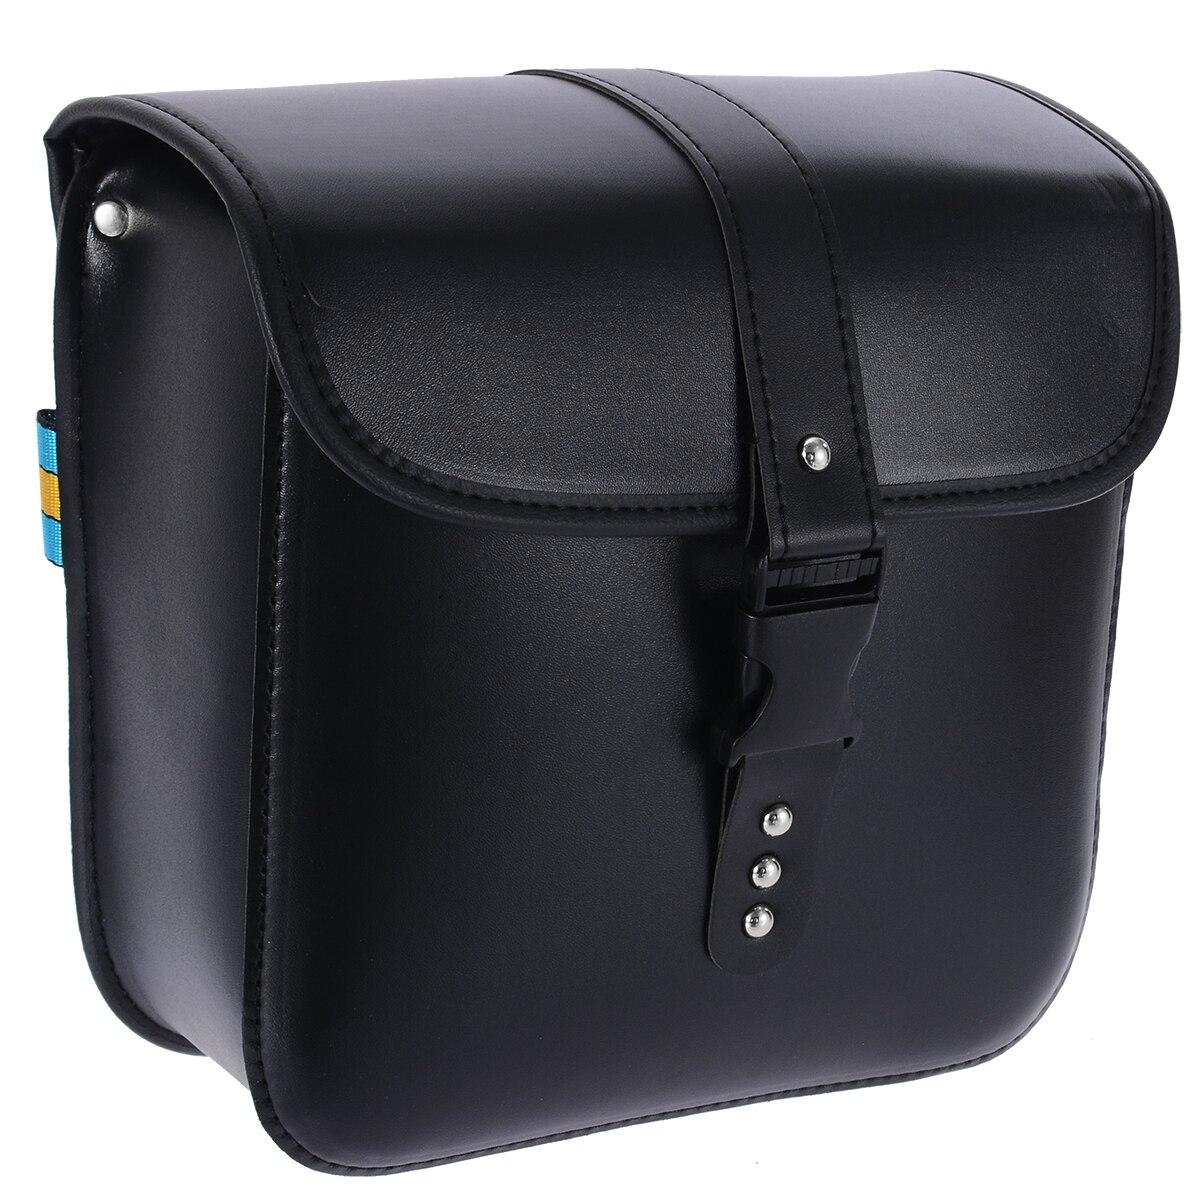 1Pair Retro Waterproof Motorcycle PU Leather Side Saddlebag Luggage Tools Bag Black